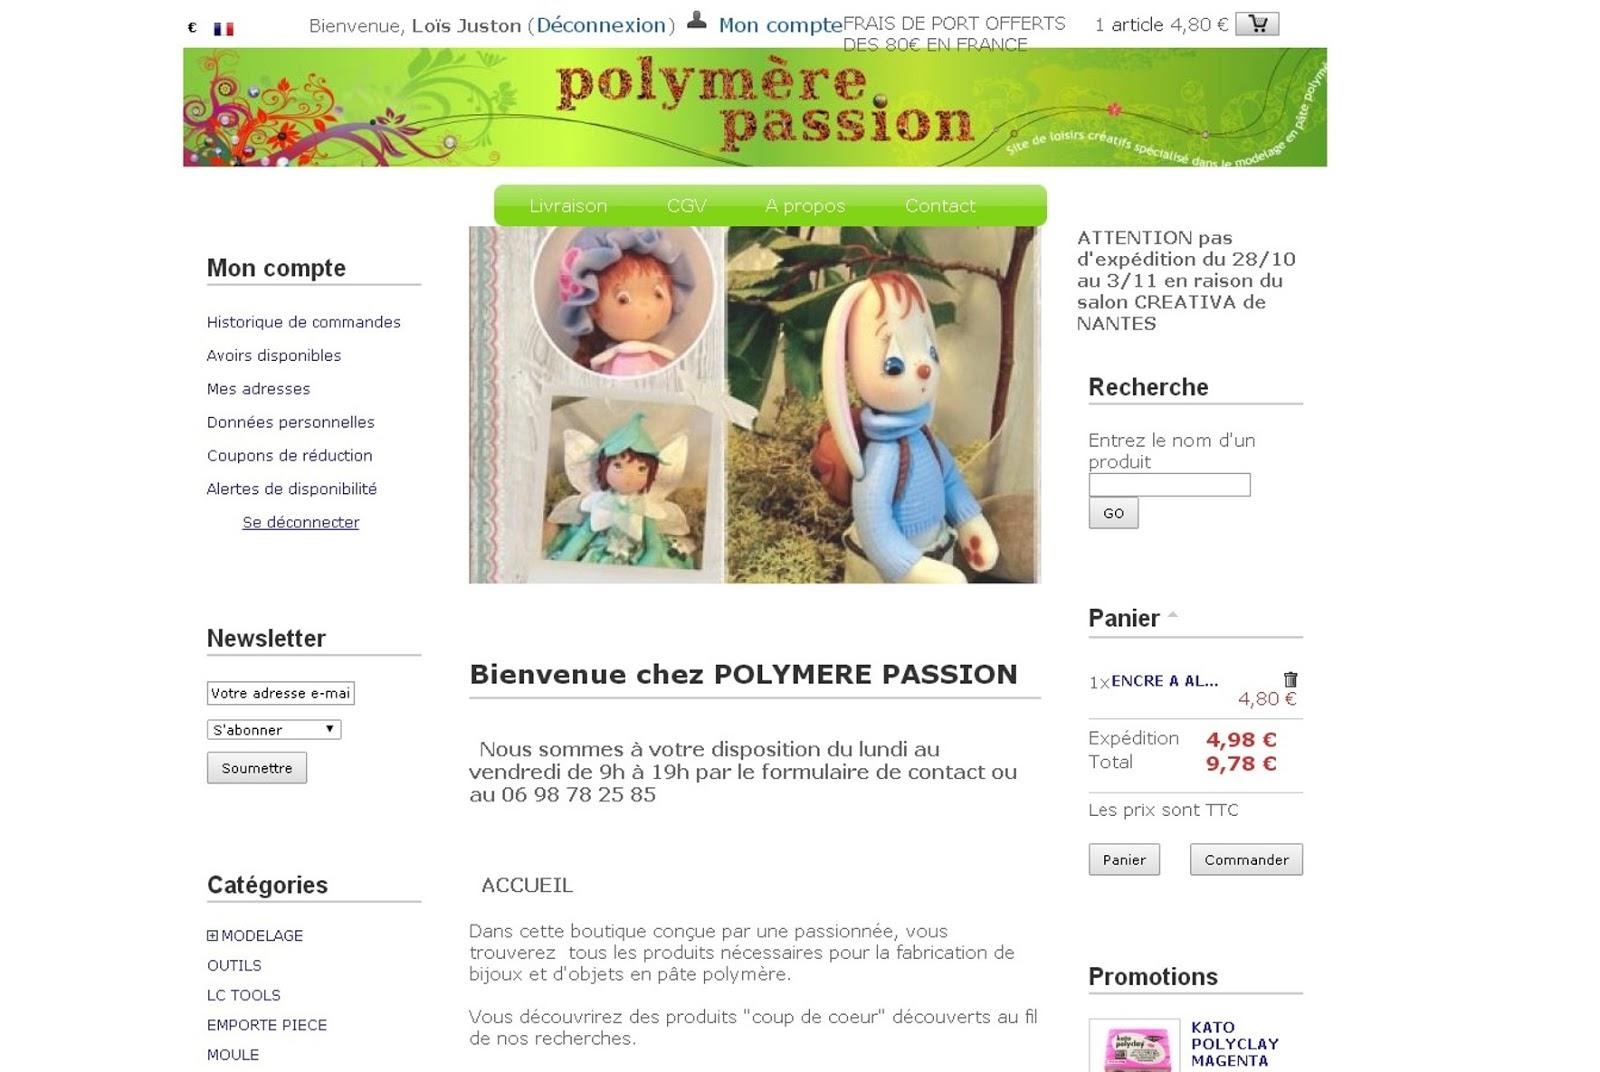 polymère passion site